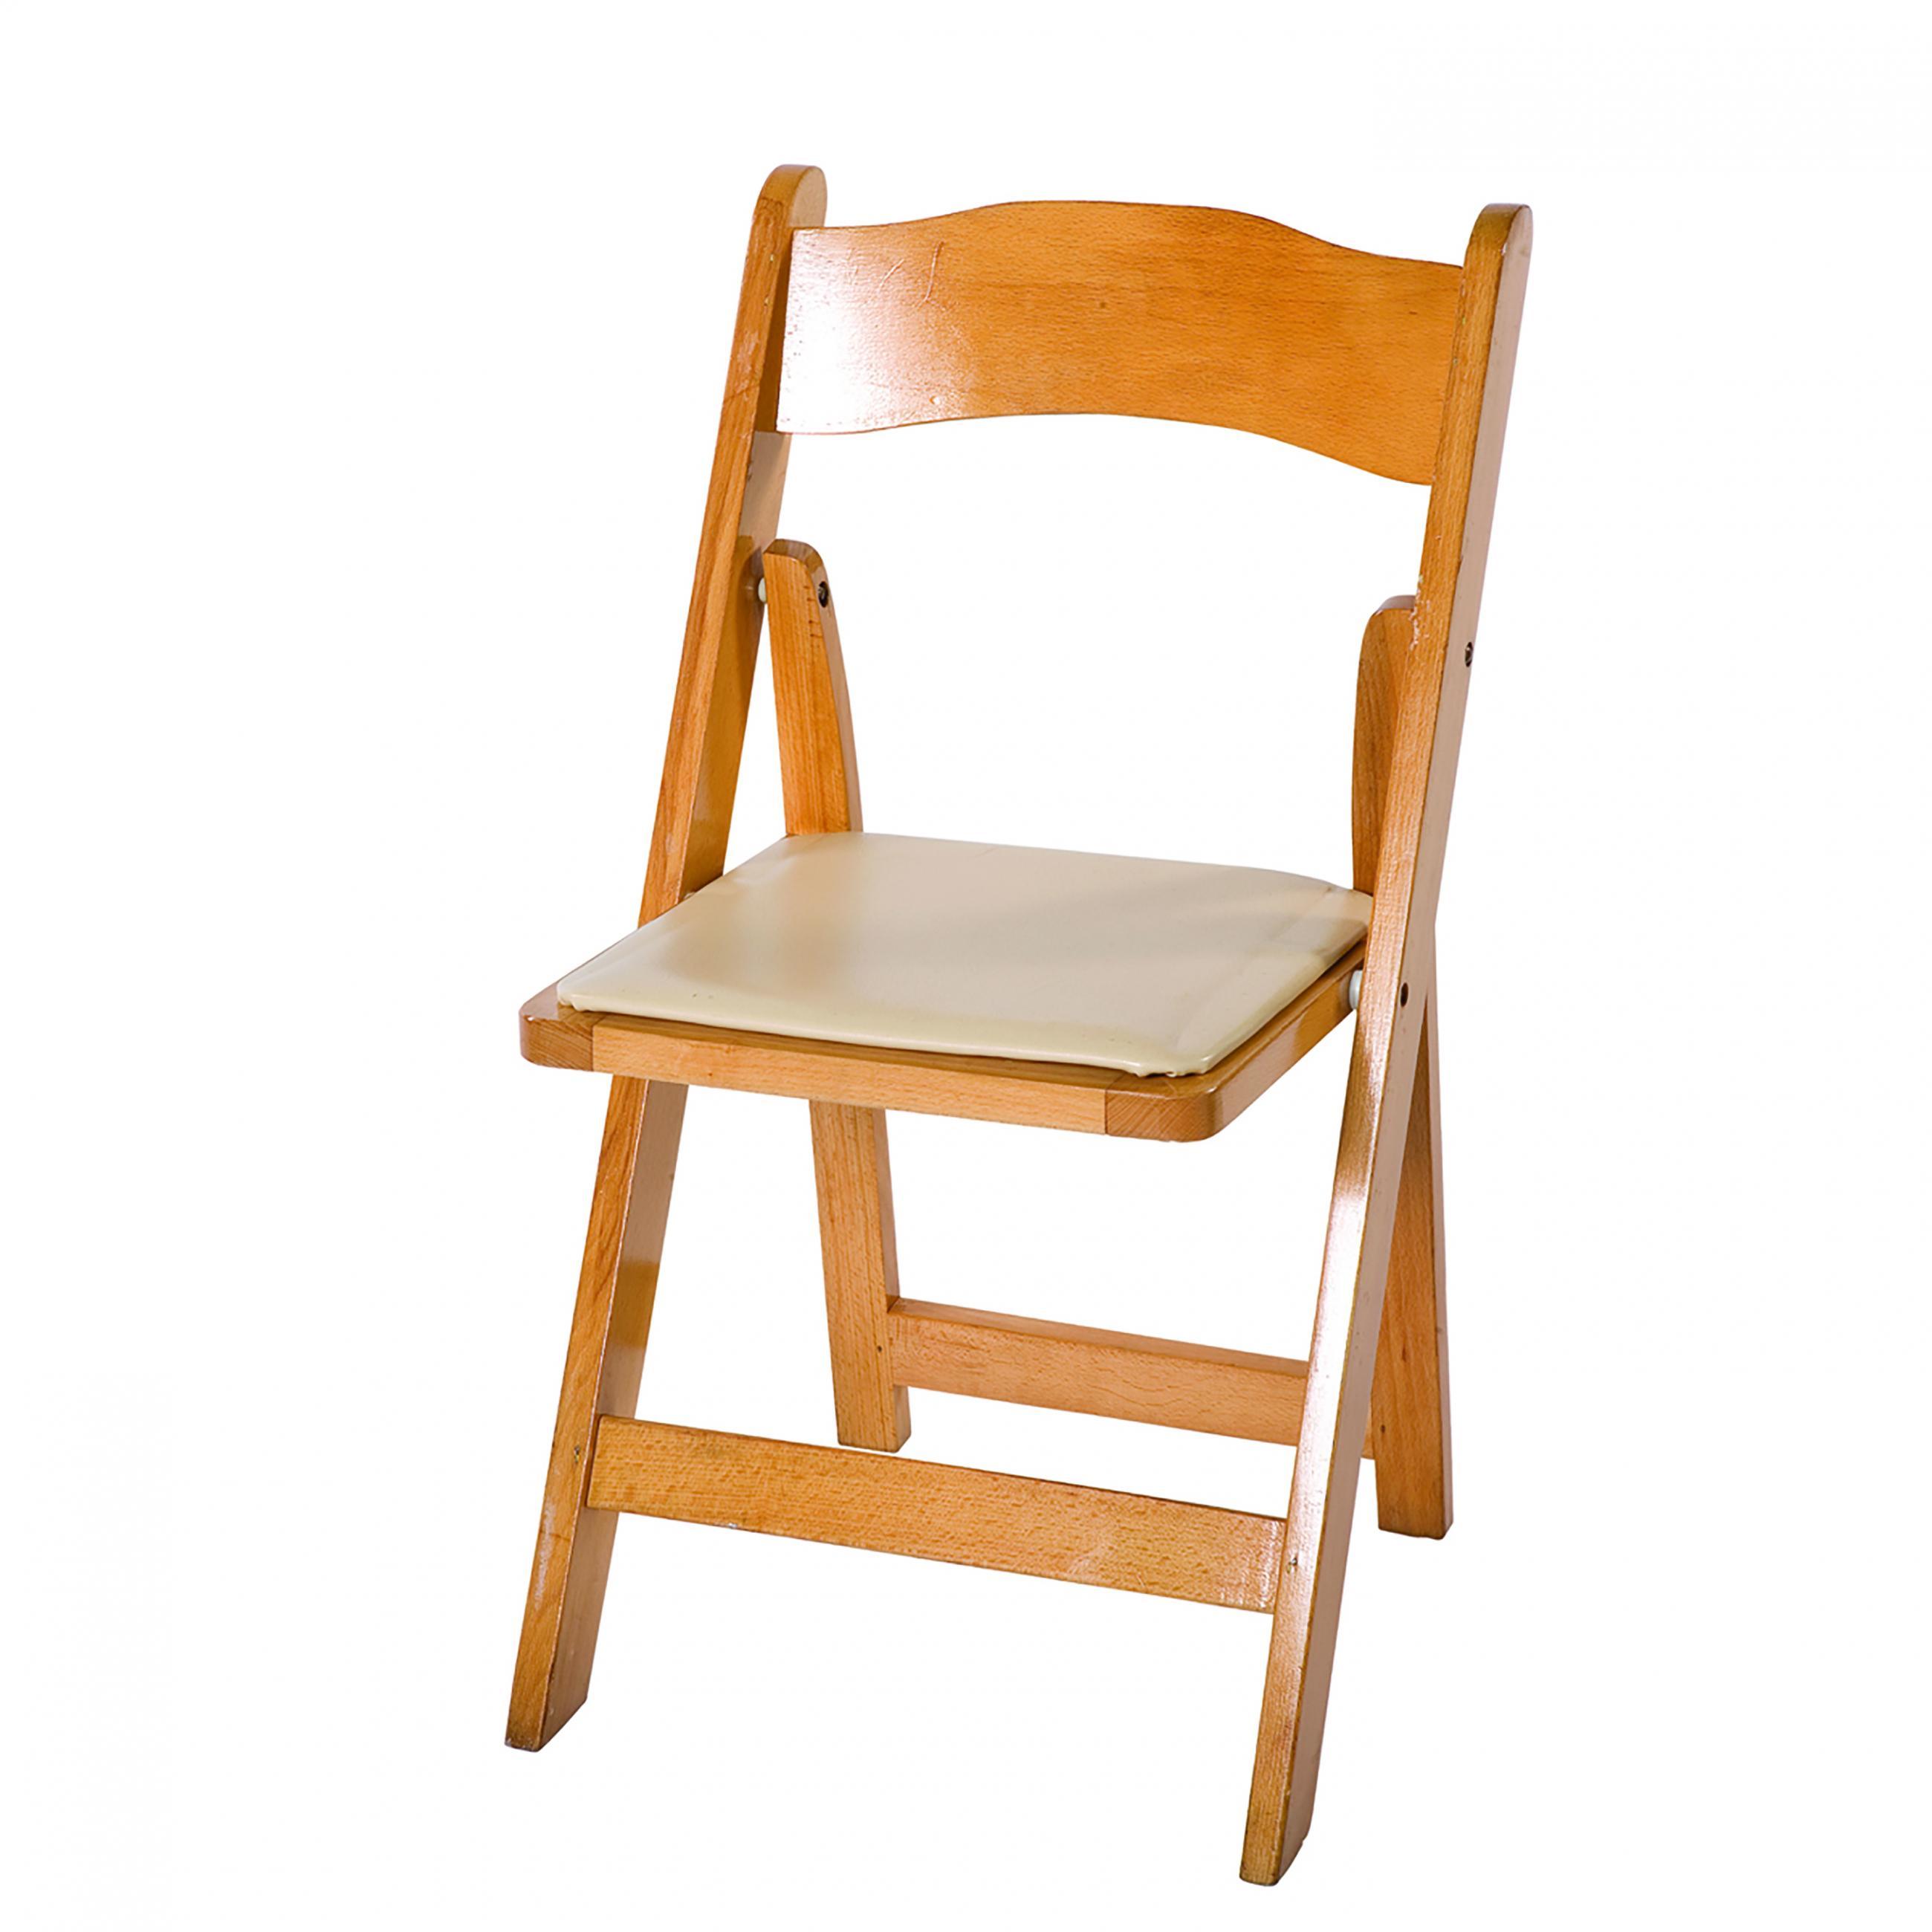 Garden Natural w/ White Cushion Chair | Peak Event Services